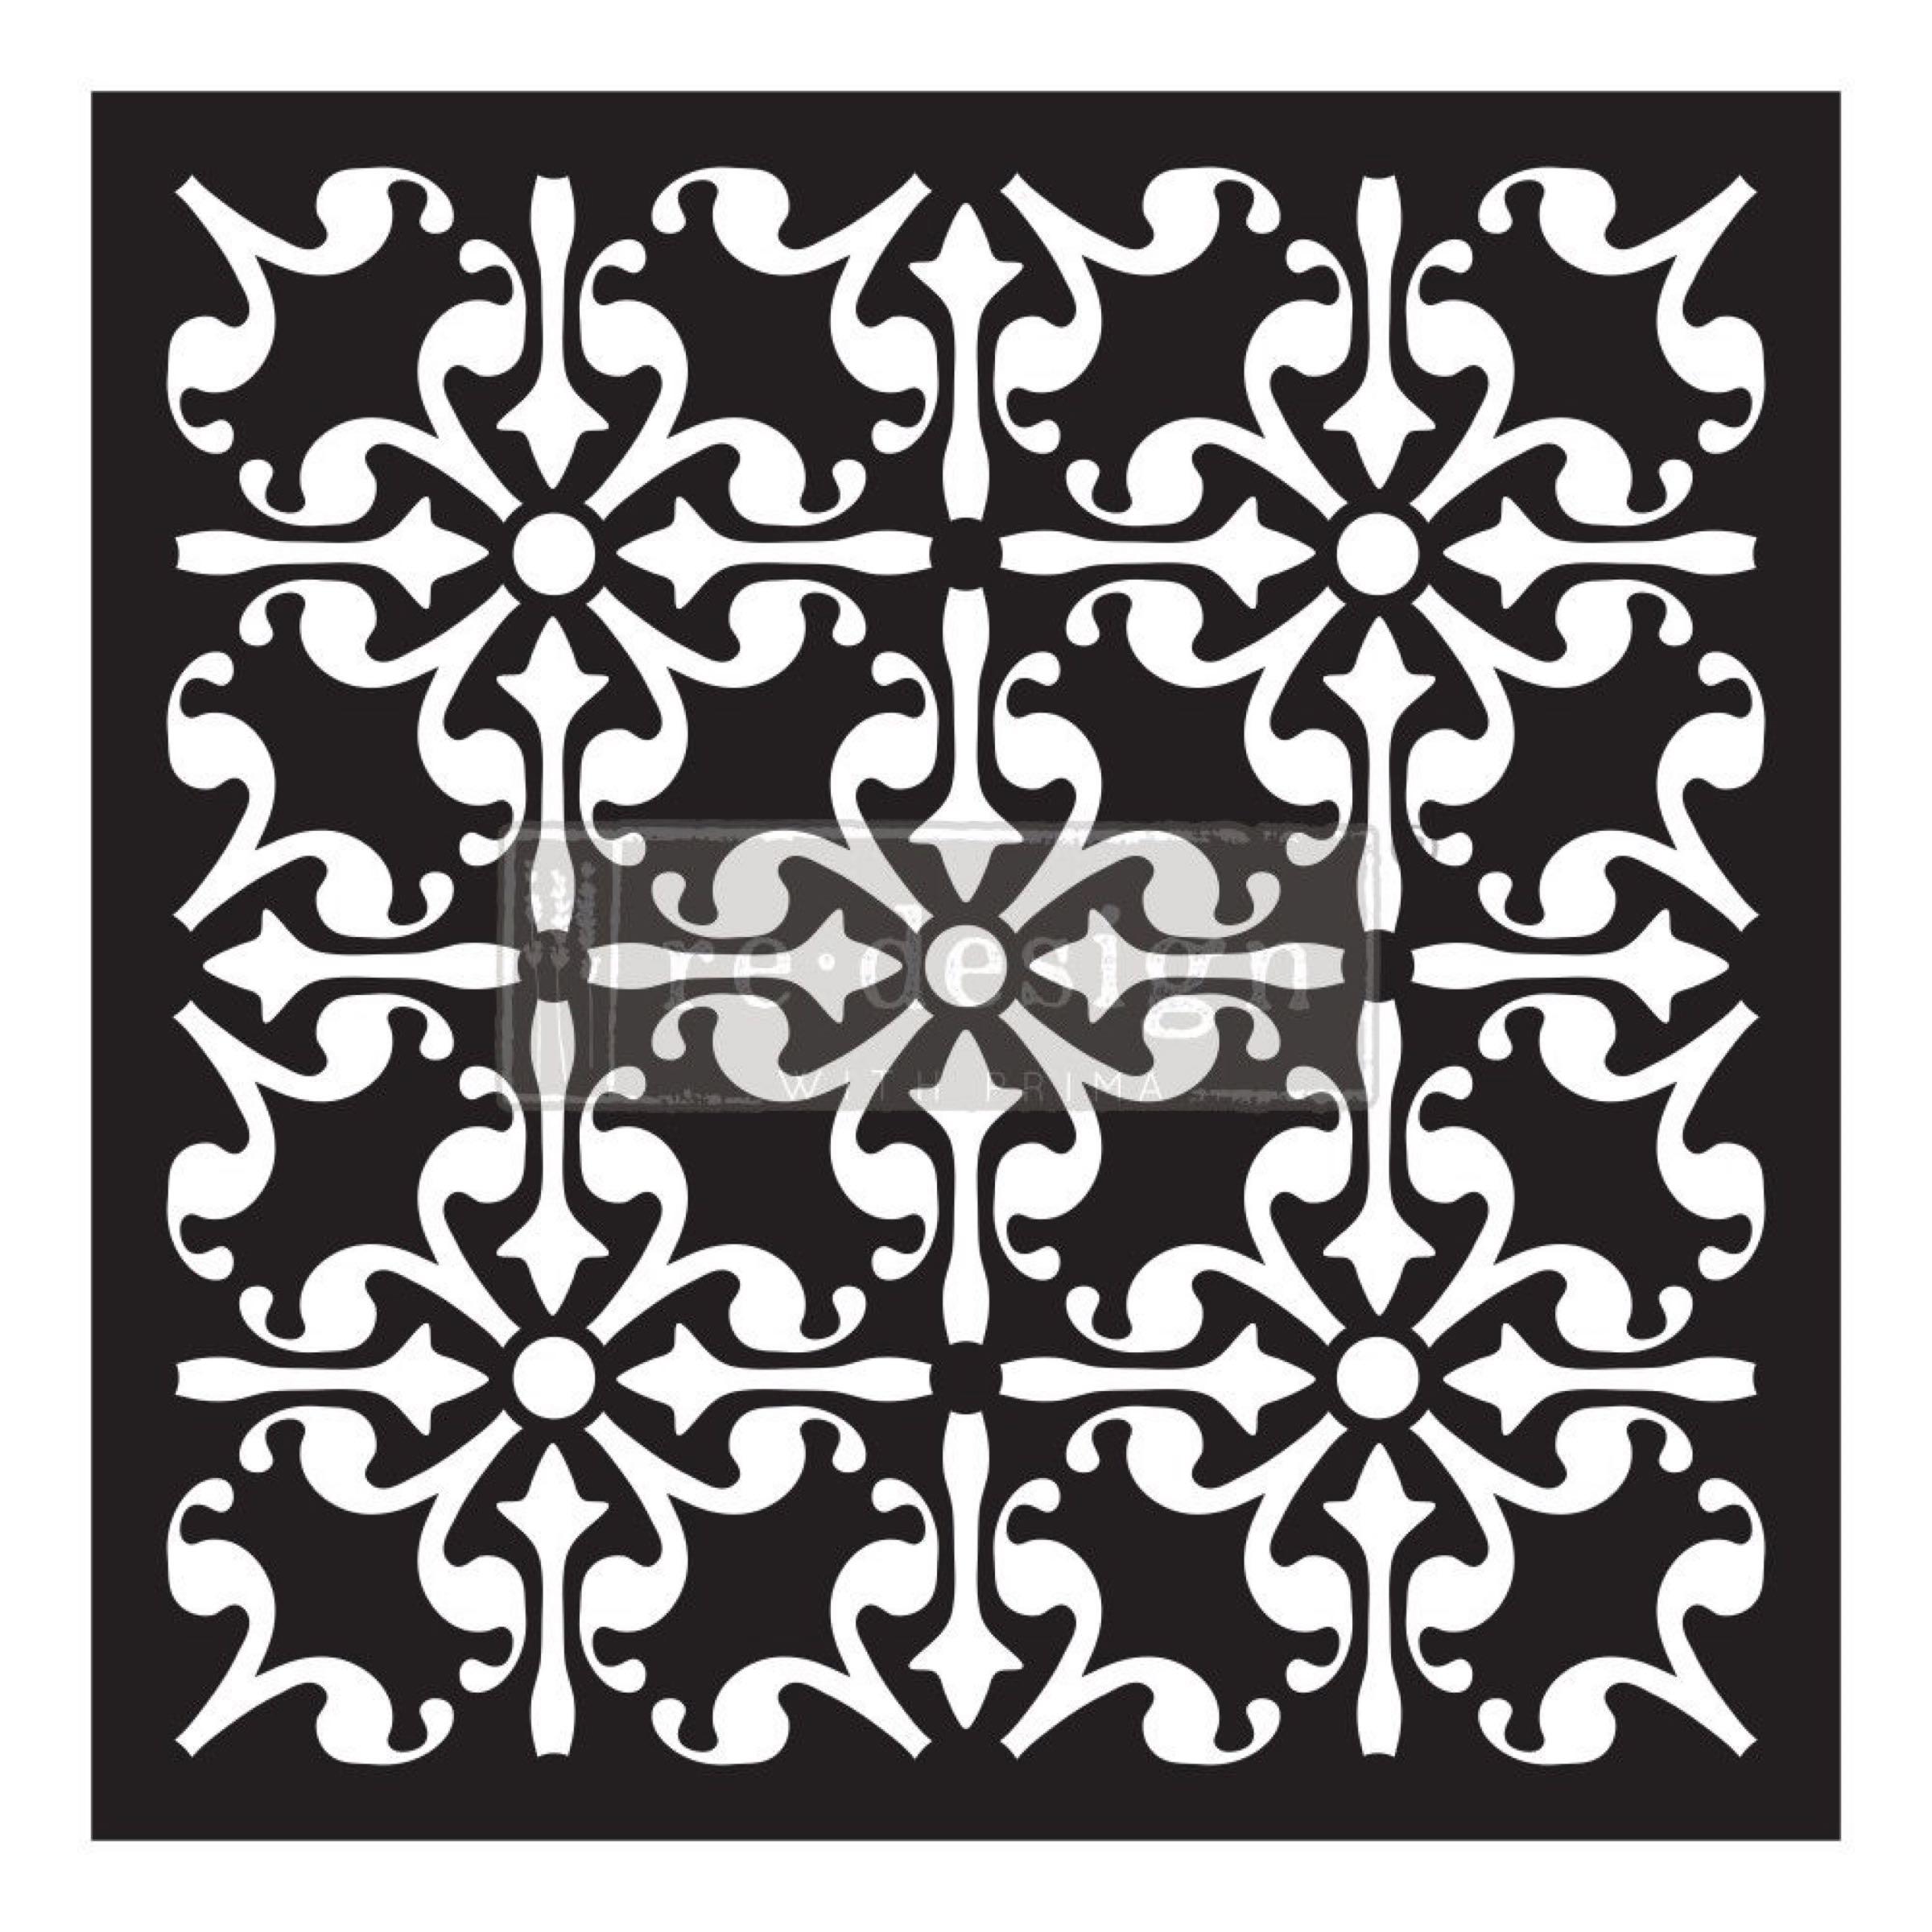 Re-Design with Prima Concrete Paver Stencil / Heller Sjablong - Lucia